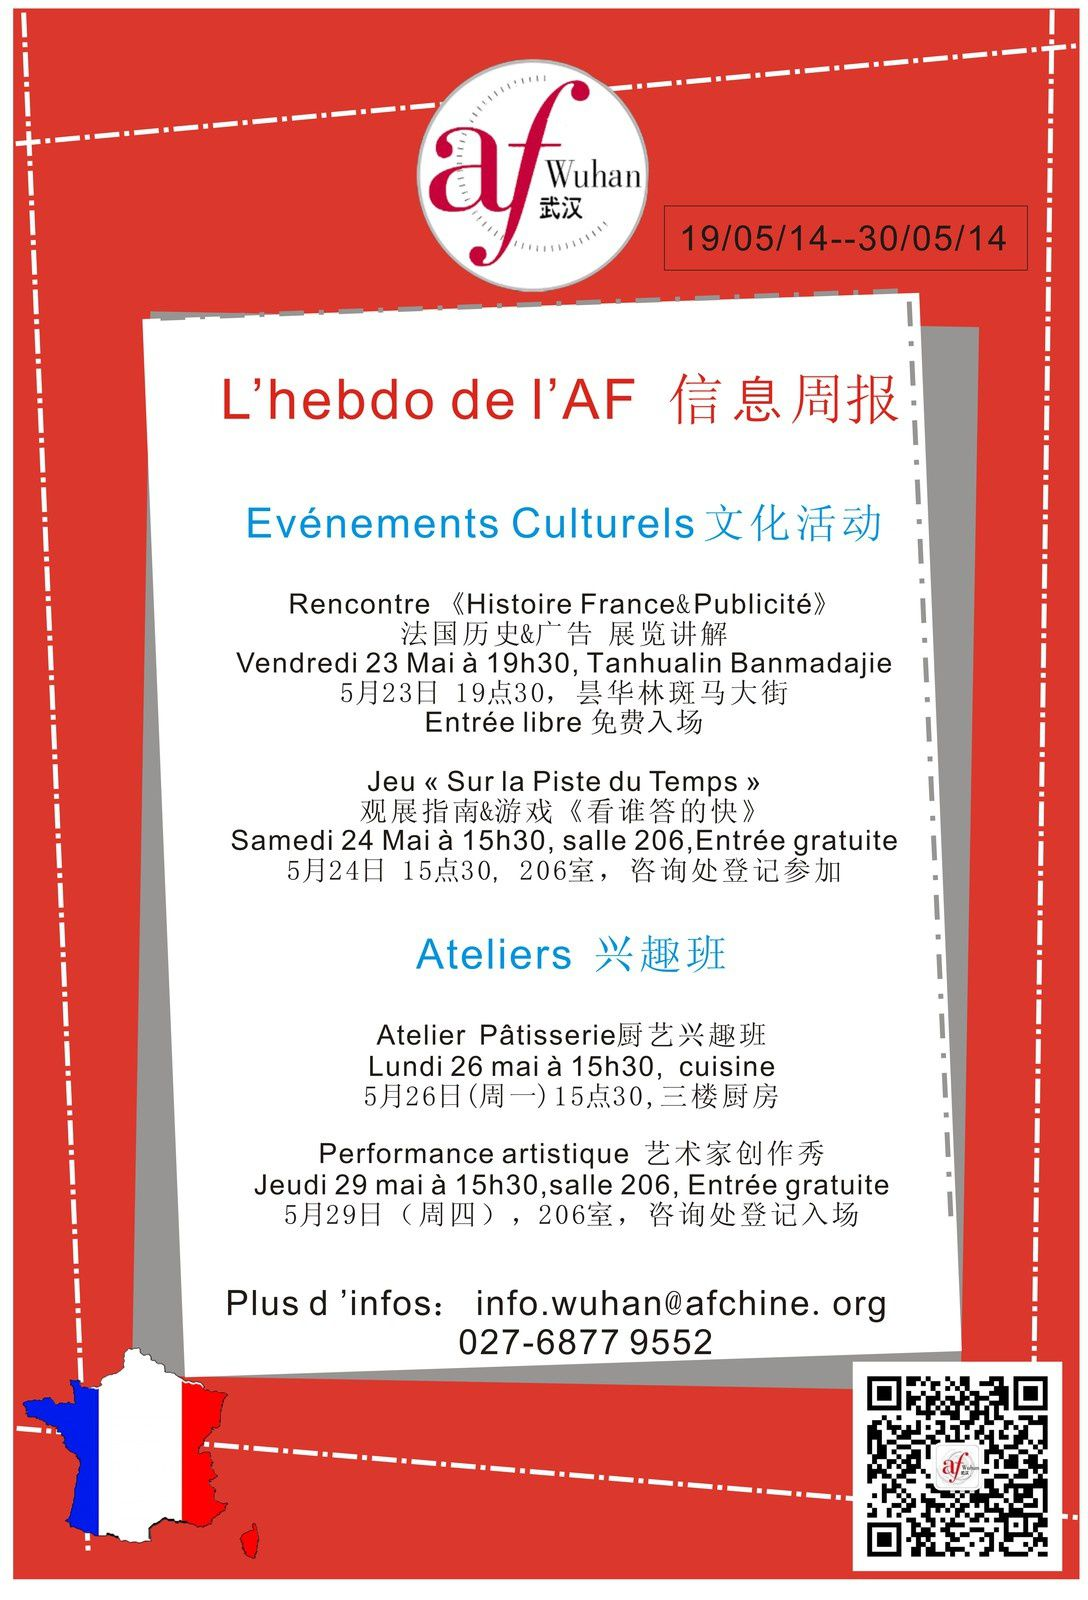 hebdo AF/武汉法语联盟信息周报